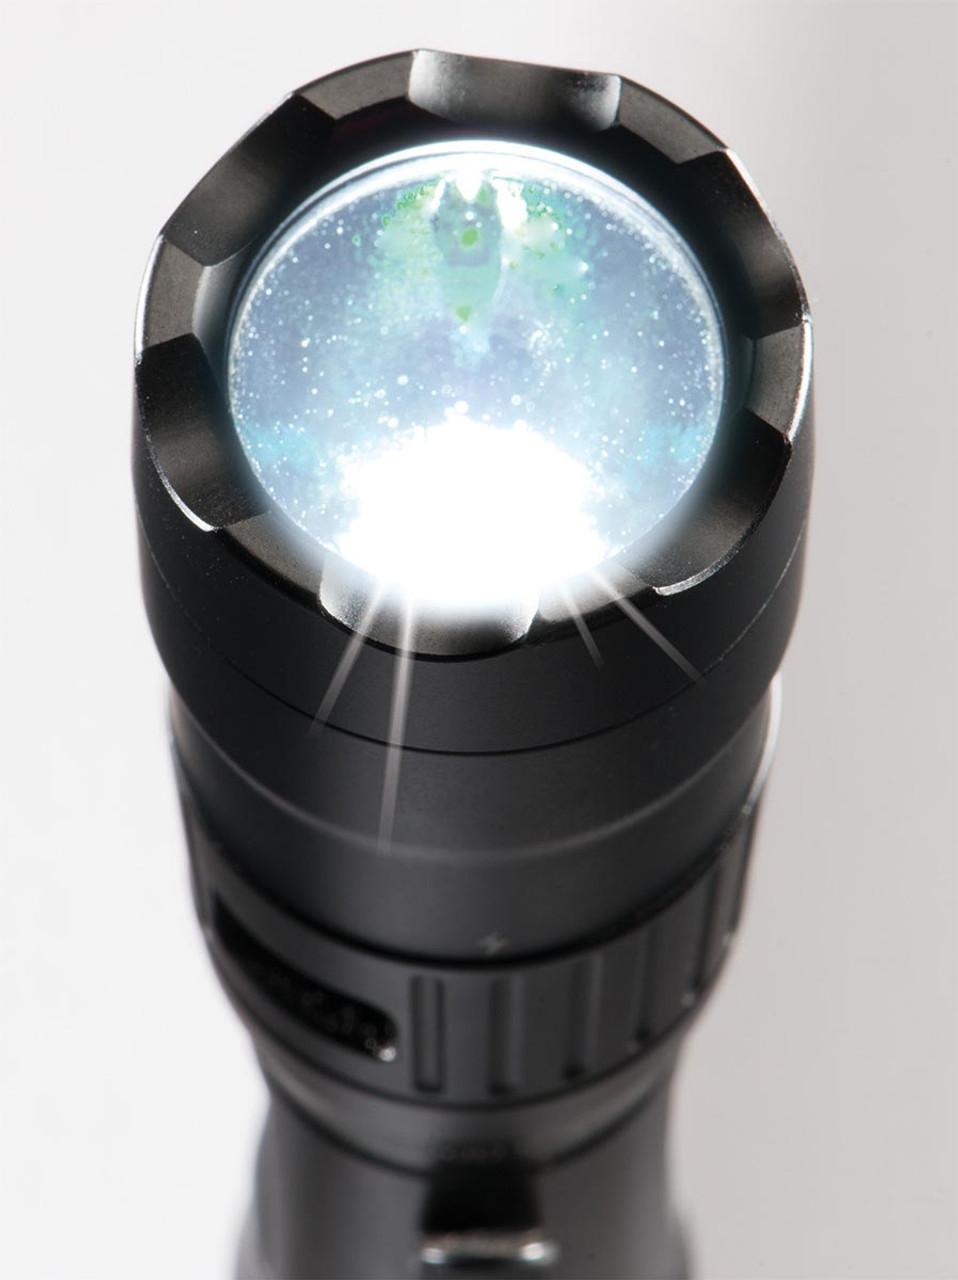 Pelican Tactical LED Flashlight, Full Time Battery Level Indication, 3 LED Color, Black 7600